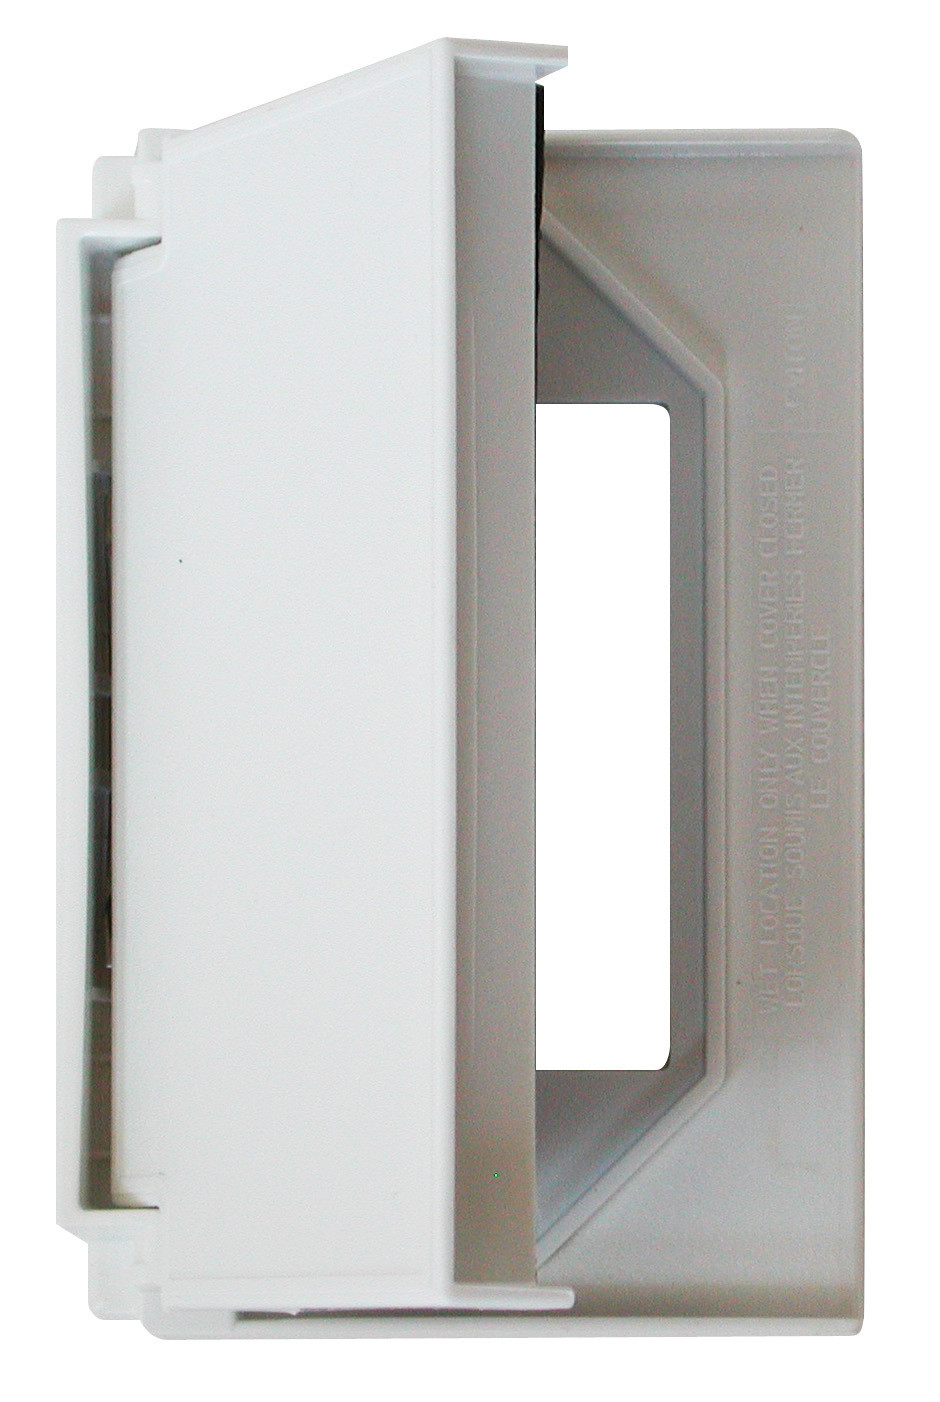 Decor Receptacle Cover - White